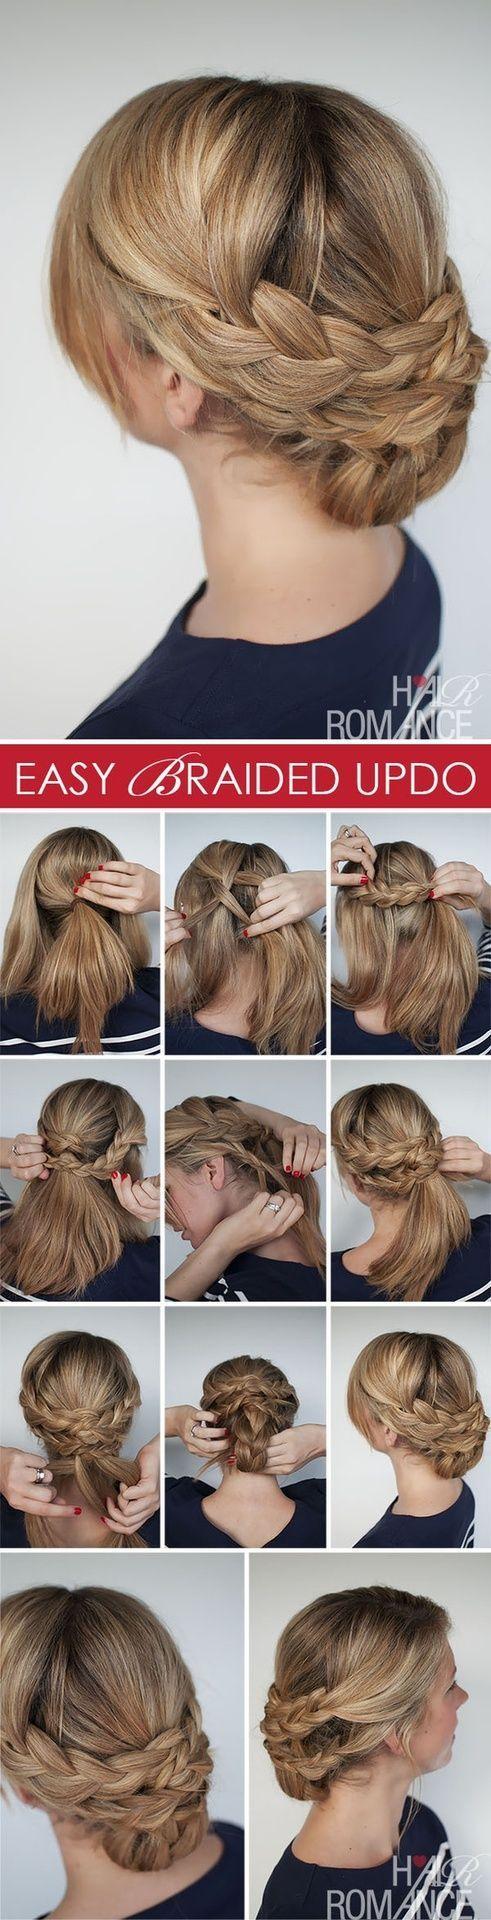 Pleasing 1000 Ideas About Easy Braided Hairstyles On Pinterest Side Short Hairstyles Gunalazisus